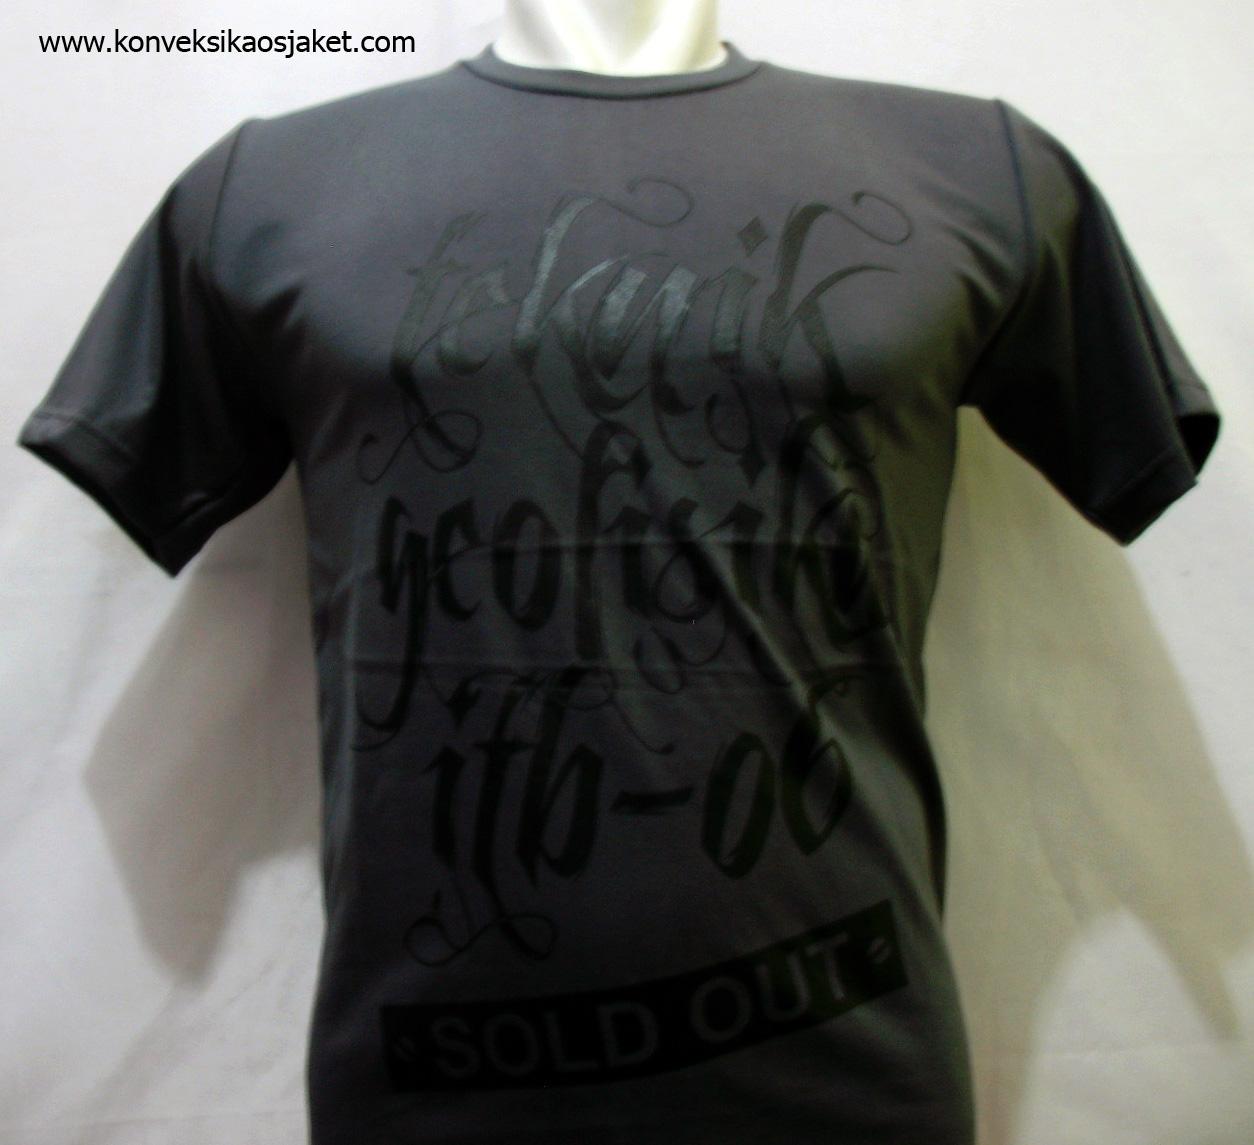 http://konveksikaosjaket.com/wp-content/uploads/2013/04/kaos-t-shirt-teknik-geofisika-itb.jpg